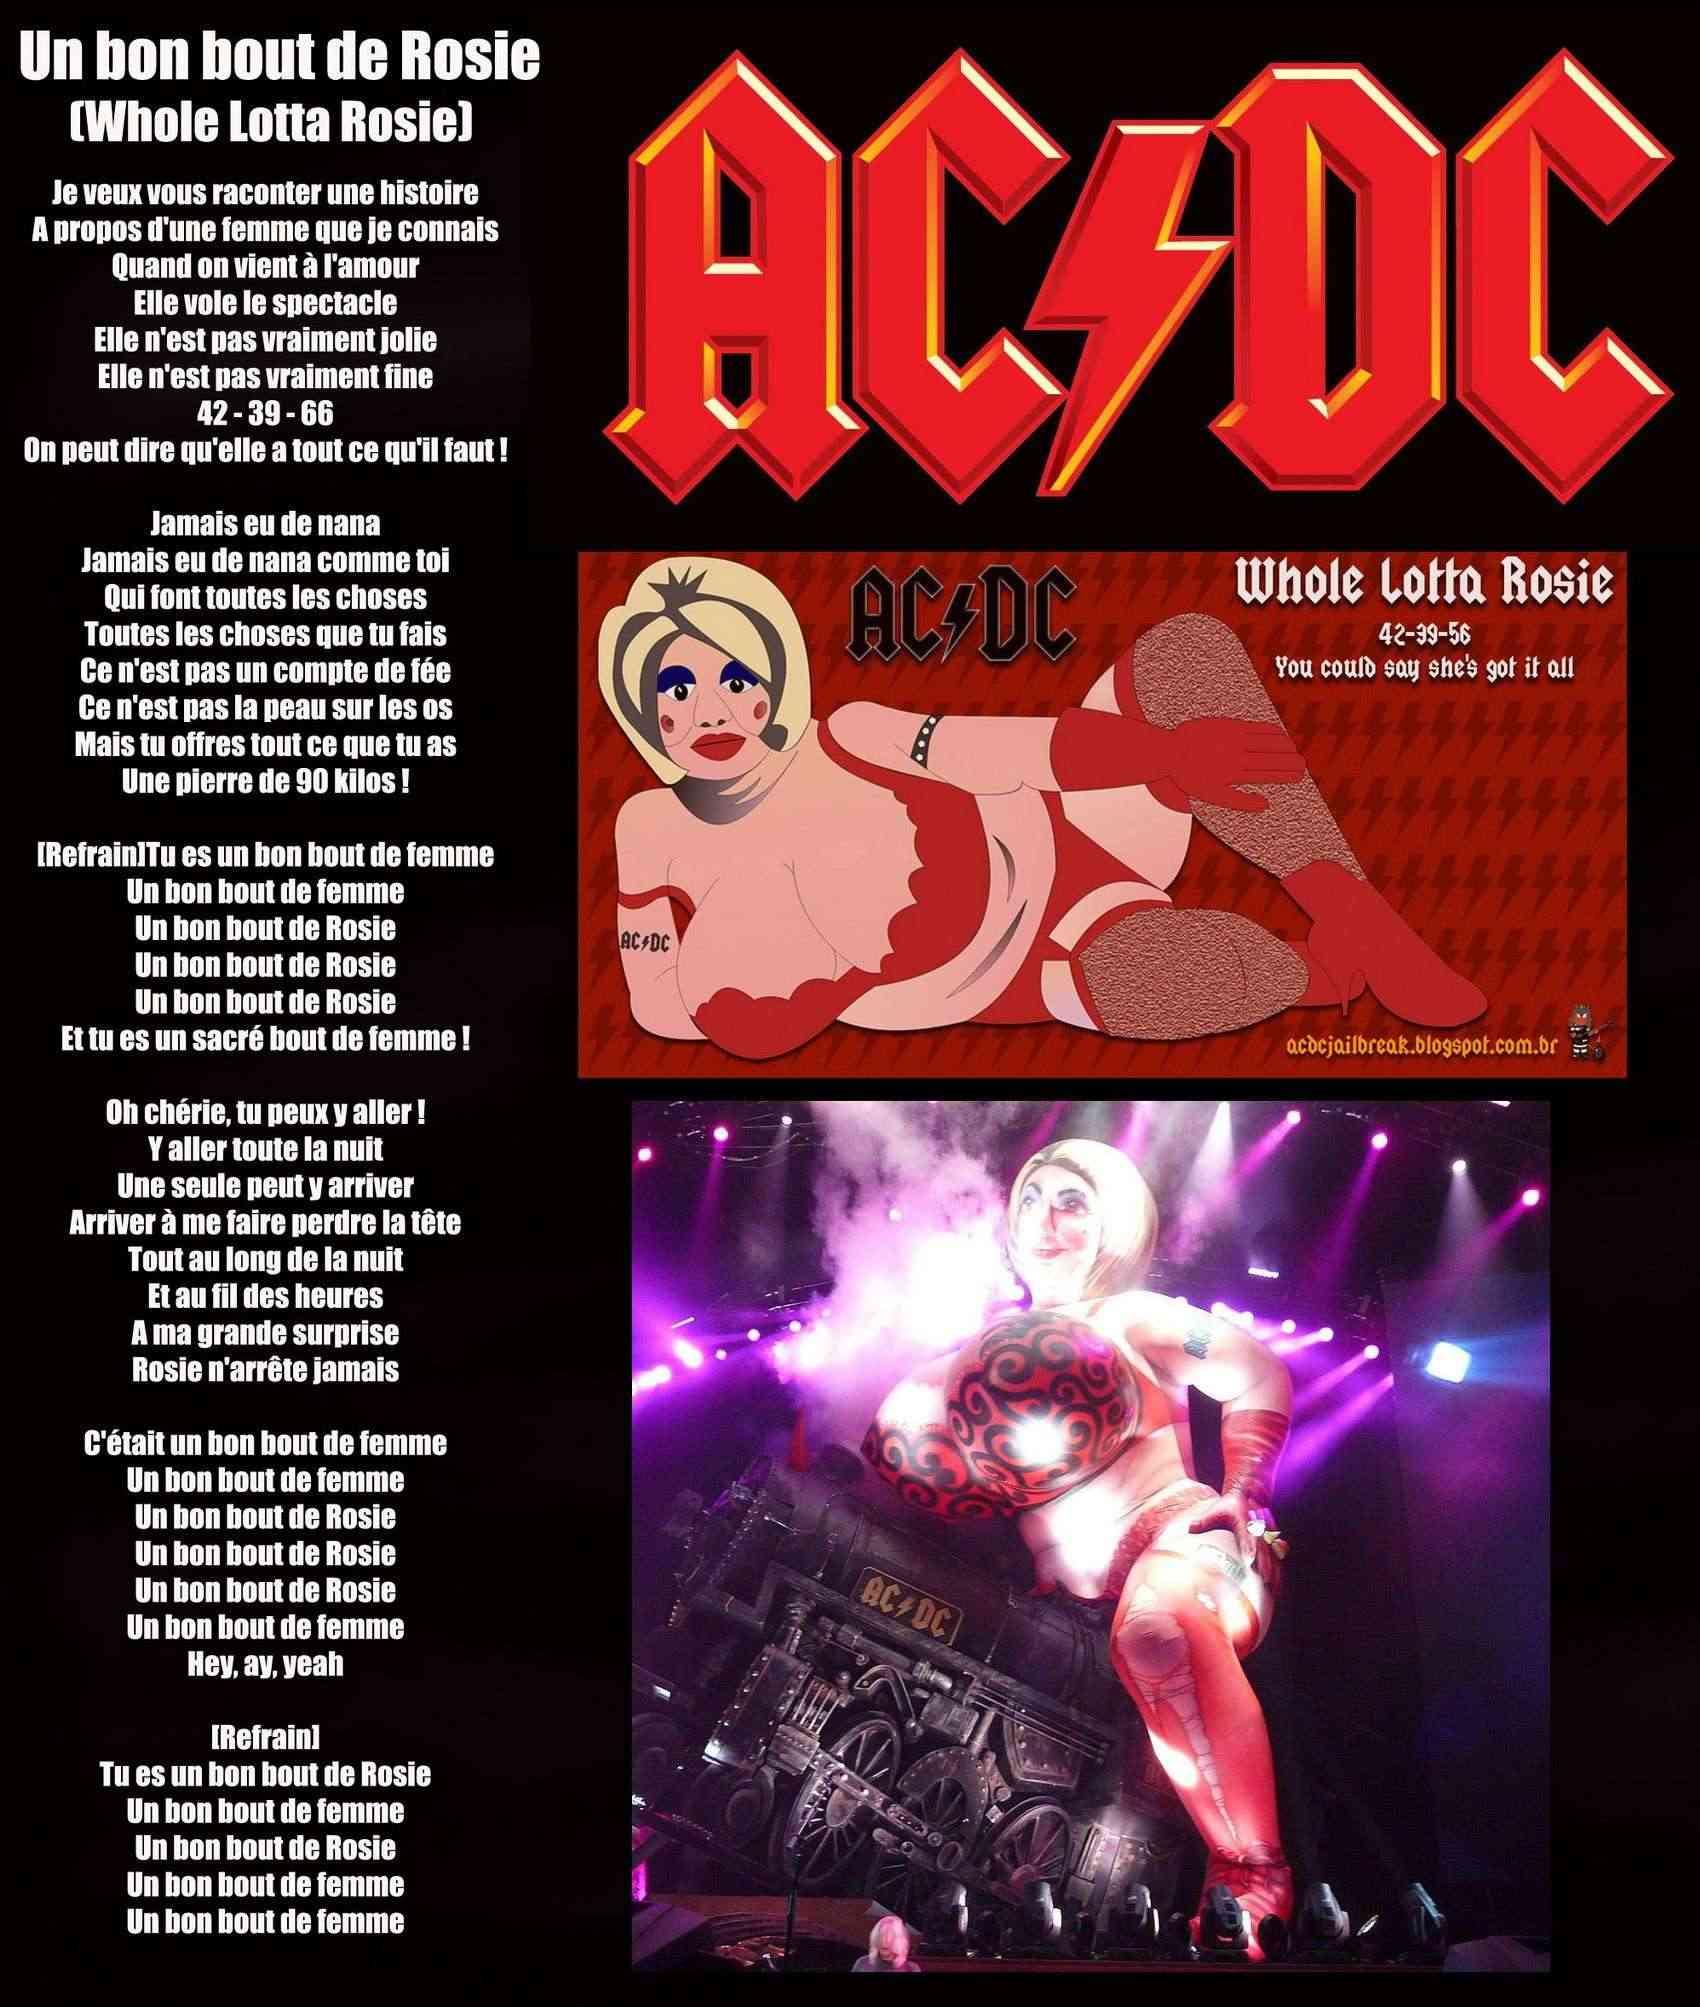 ACDC Whole Lotta Rosie (1977) Un bon bout de Rosie Acdc_w10